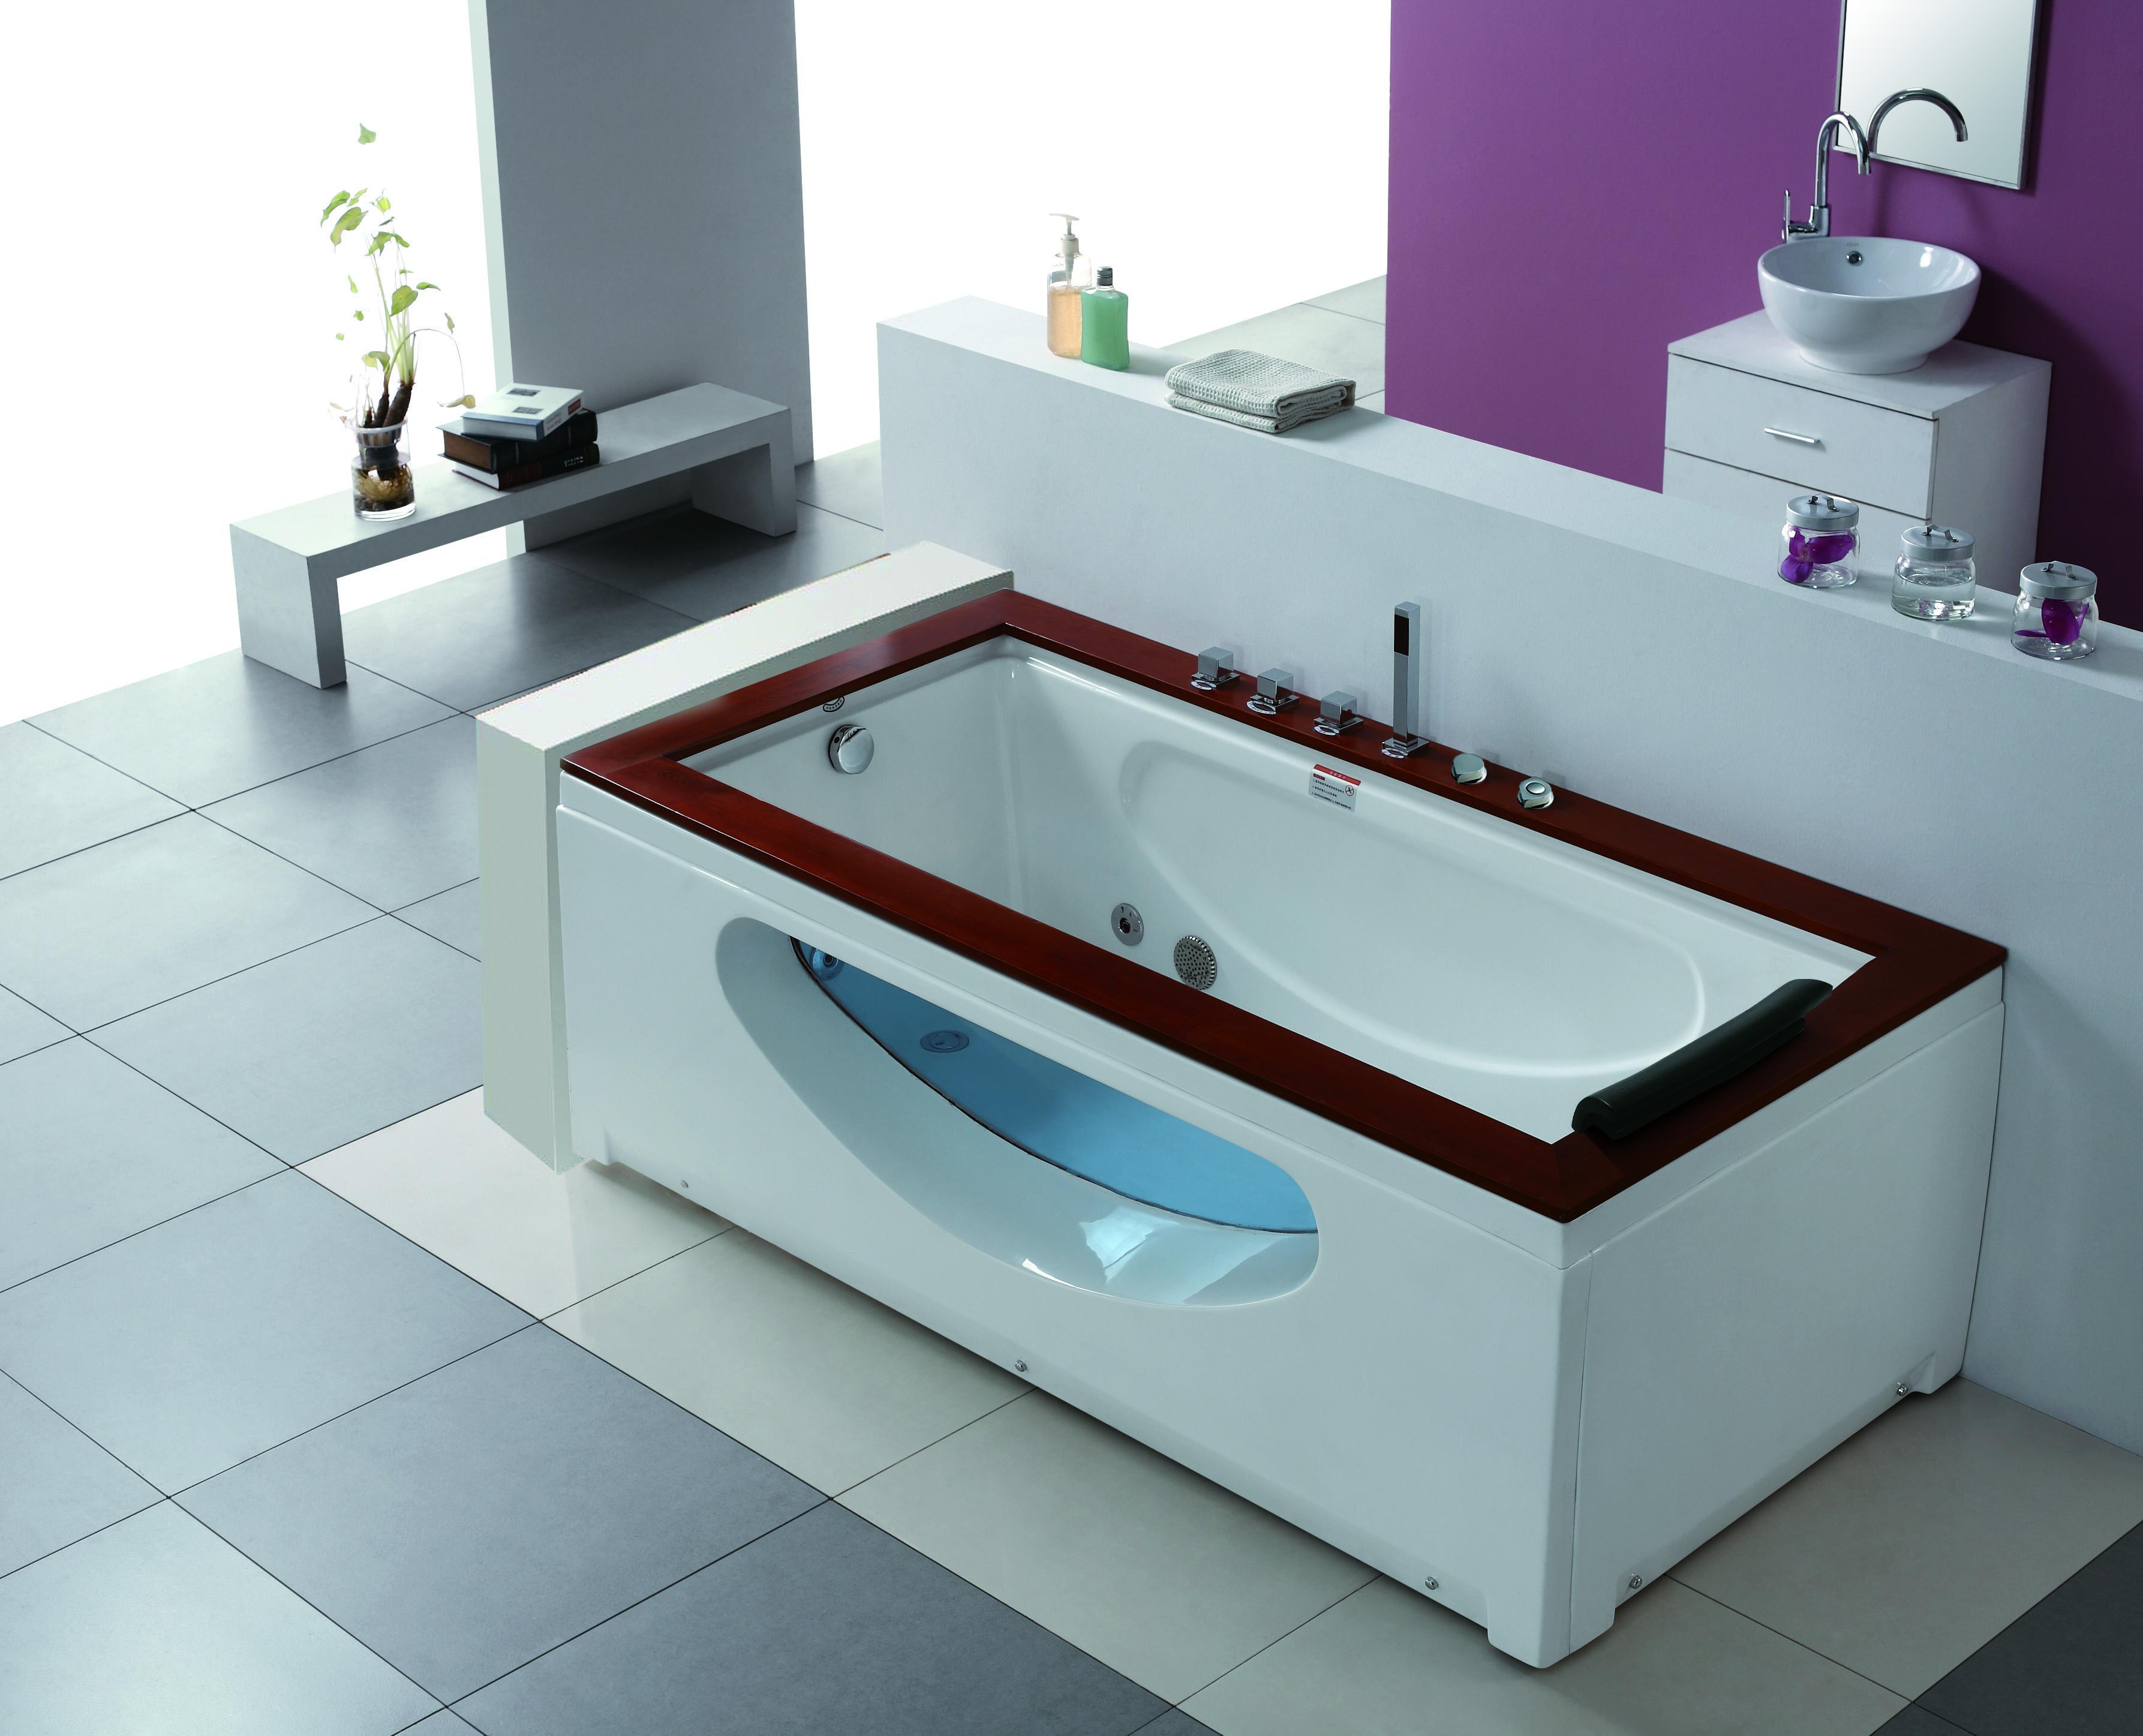 1 personen whirlpool denver badewanne whirlwanne teak. Black Bedroom Furniture Sets. Home Design Ideas